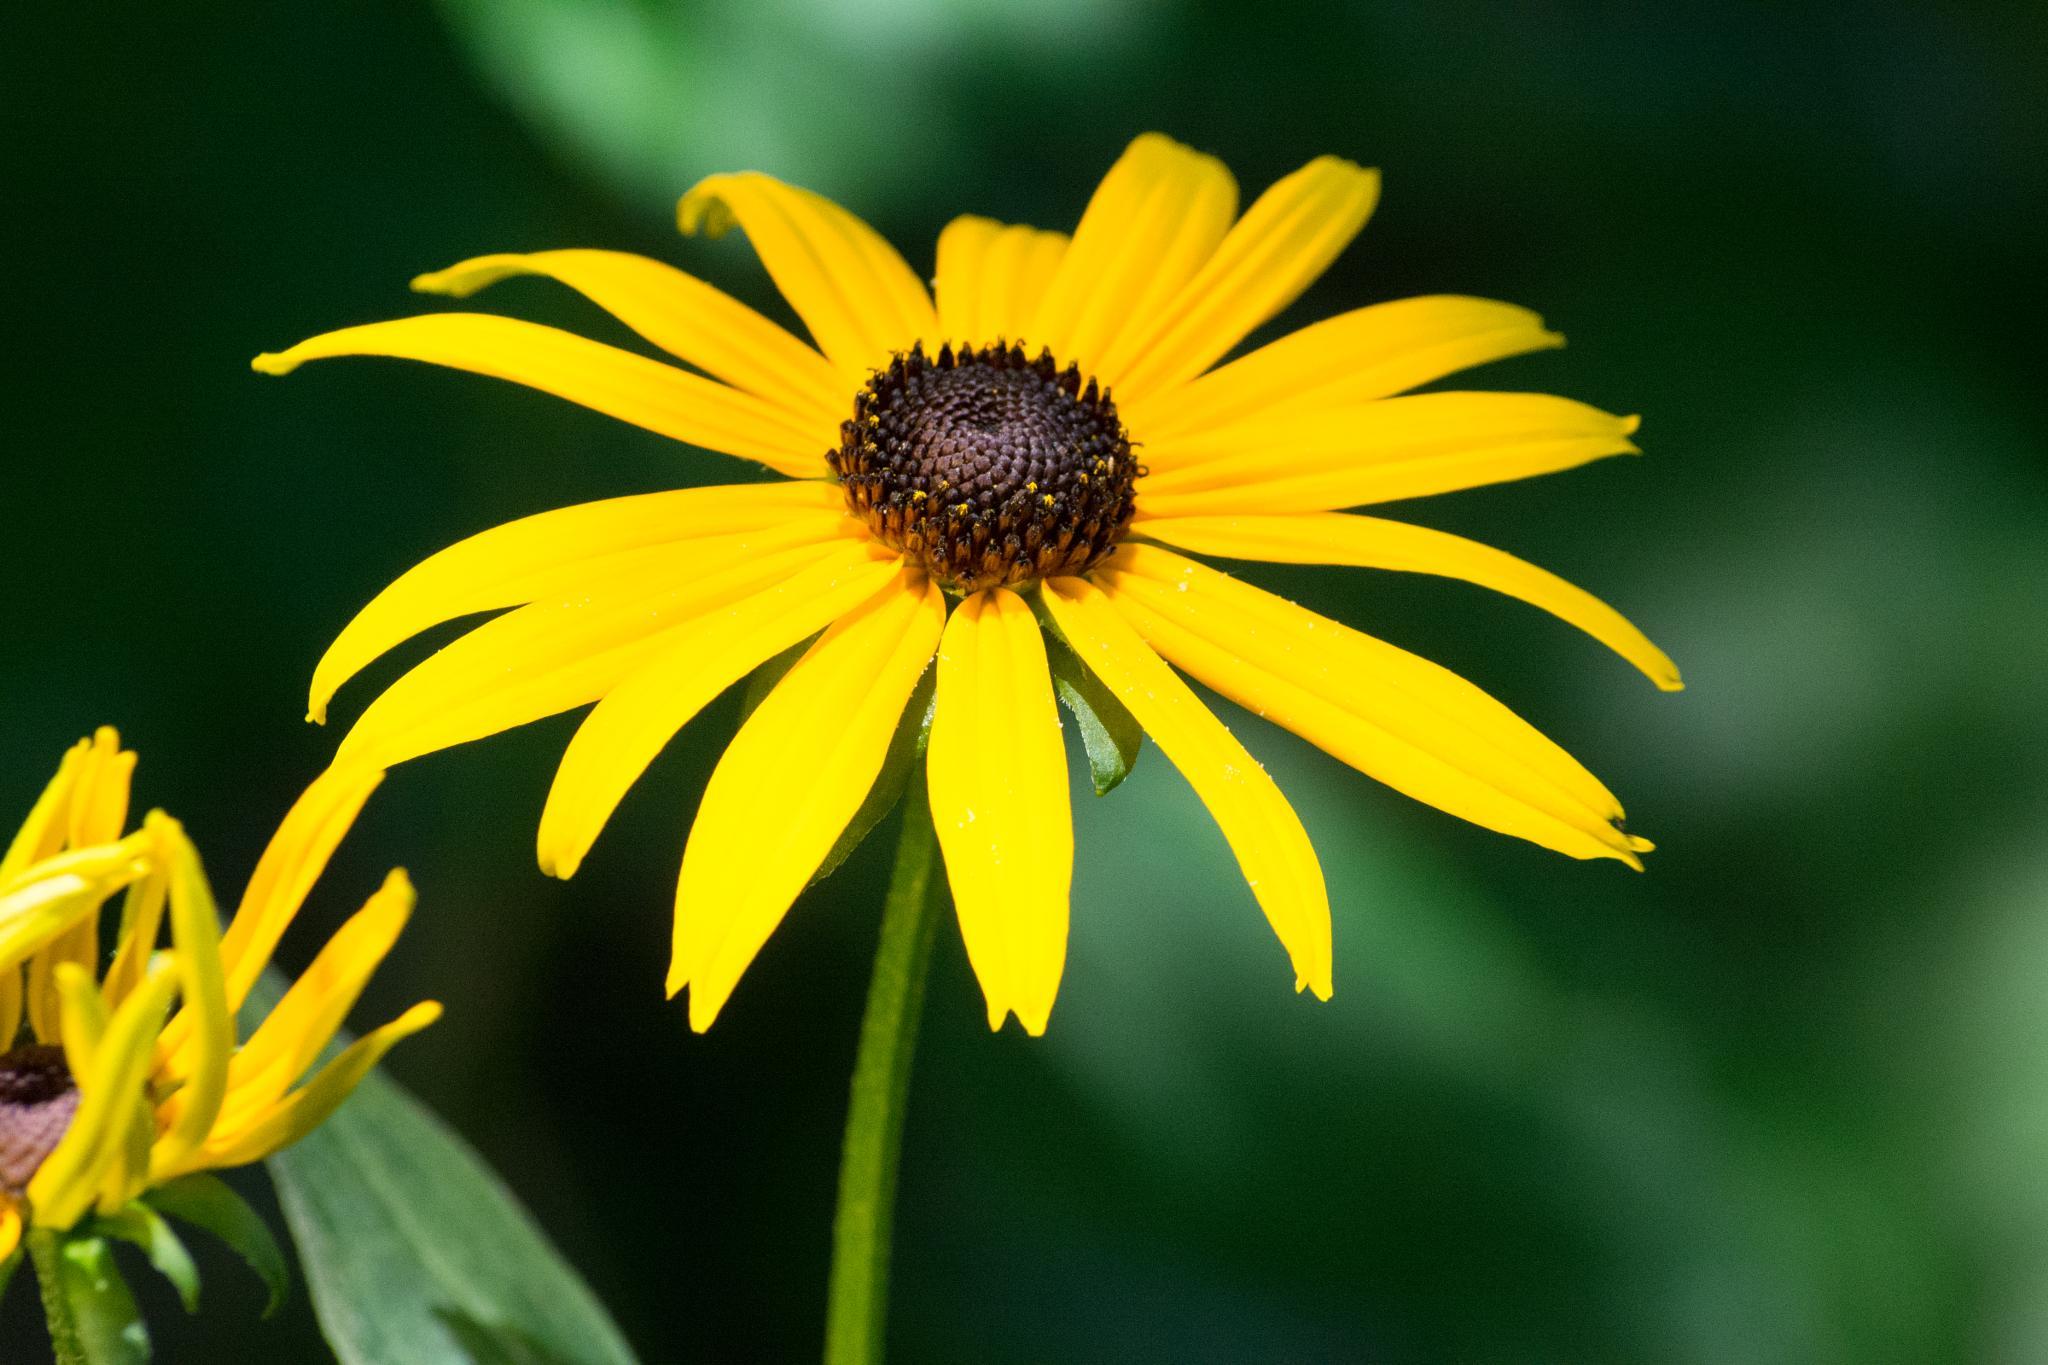 Yellow Flower by Papabob